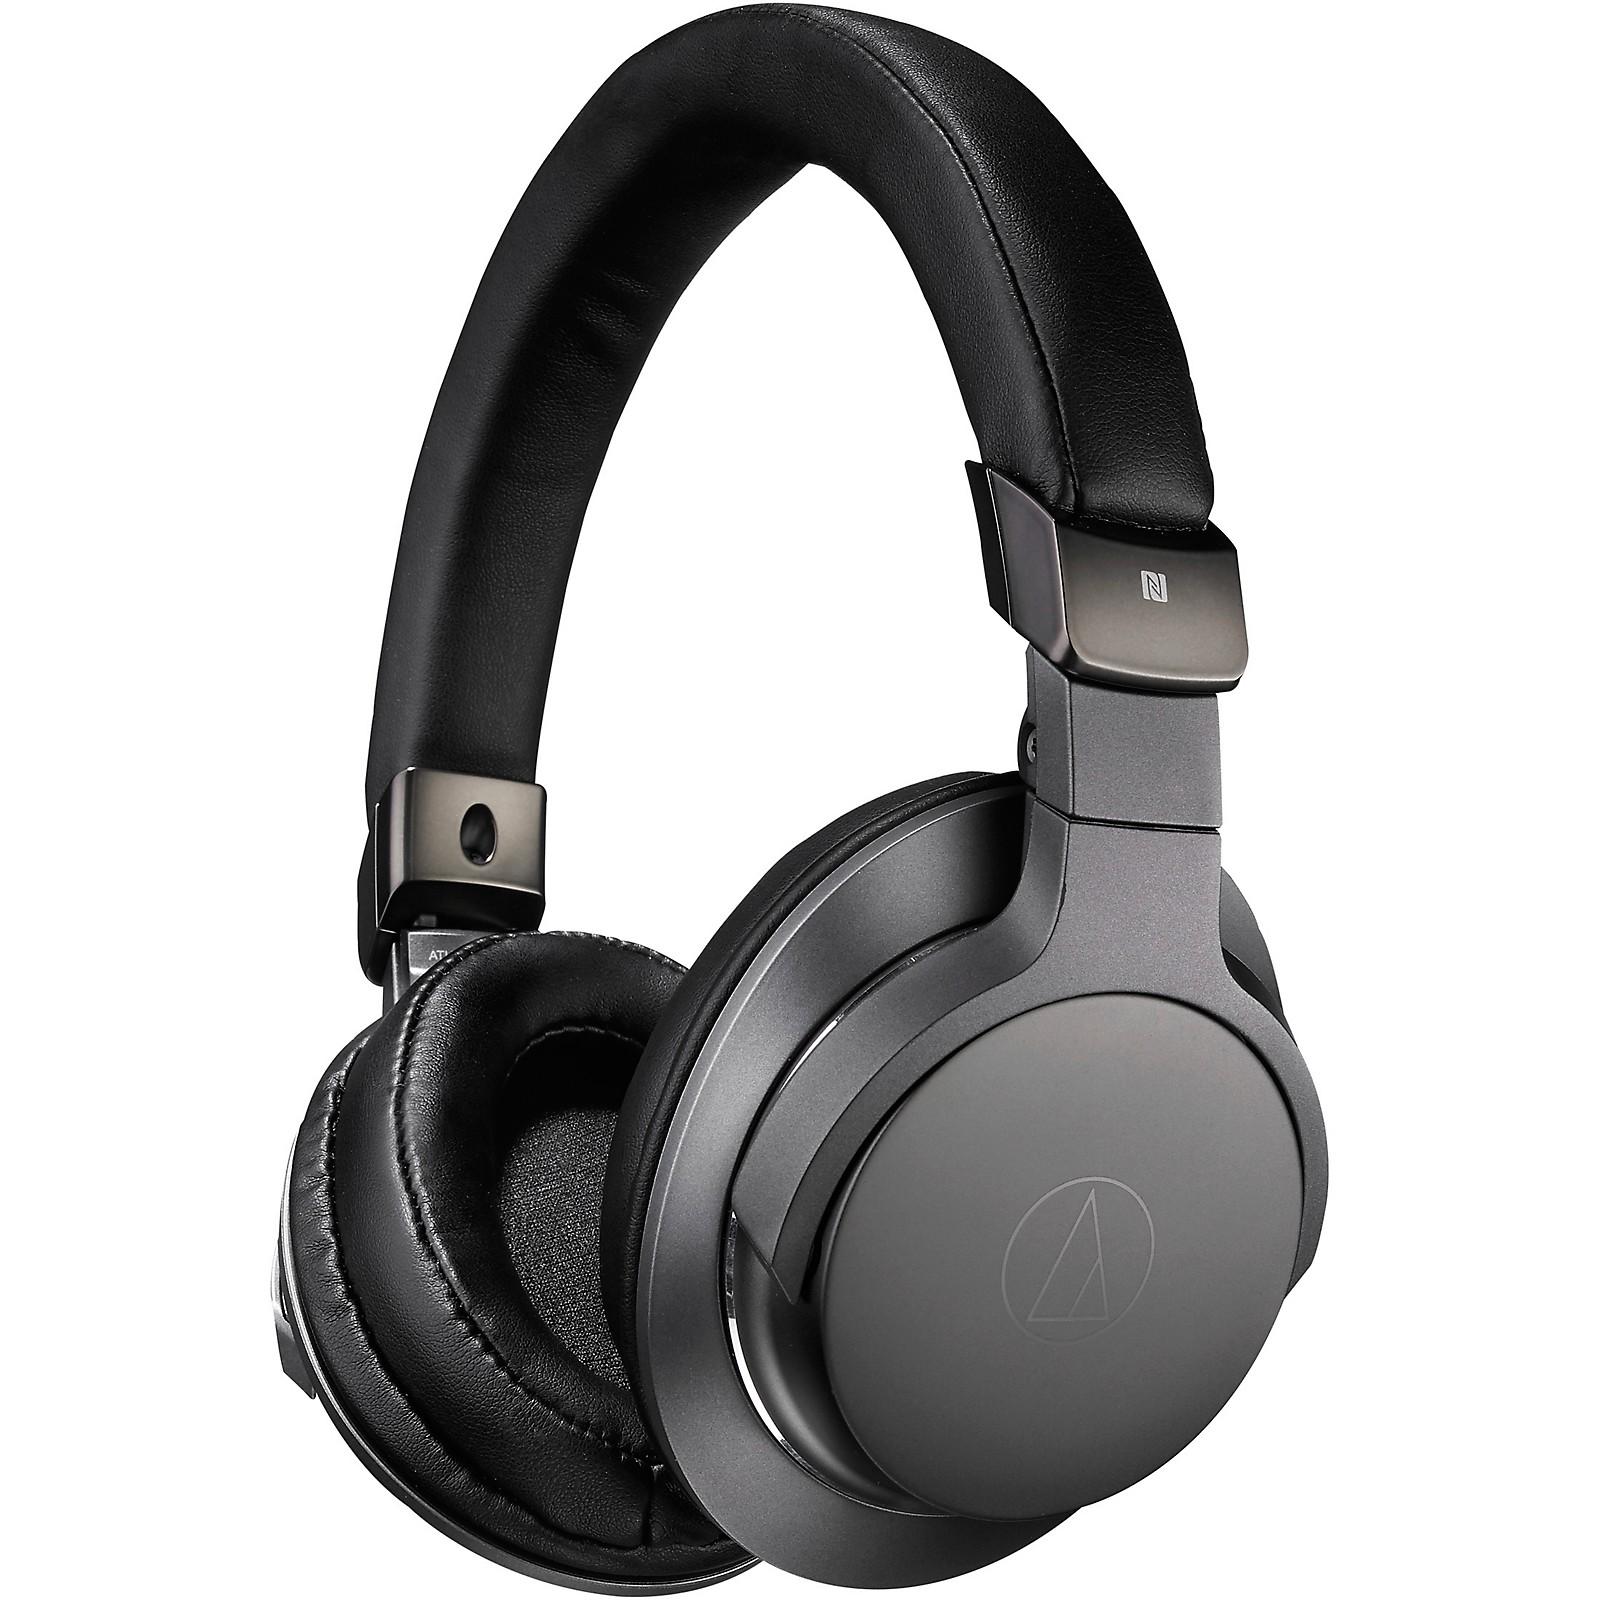 Open Box Audio-Technica ATH-SR6BT Wireless Over-Ear High Resolution Headphones